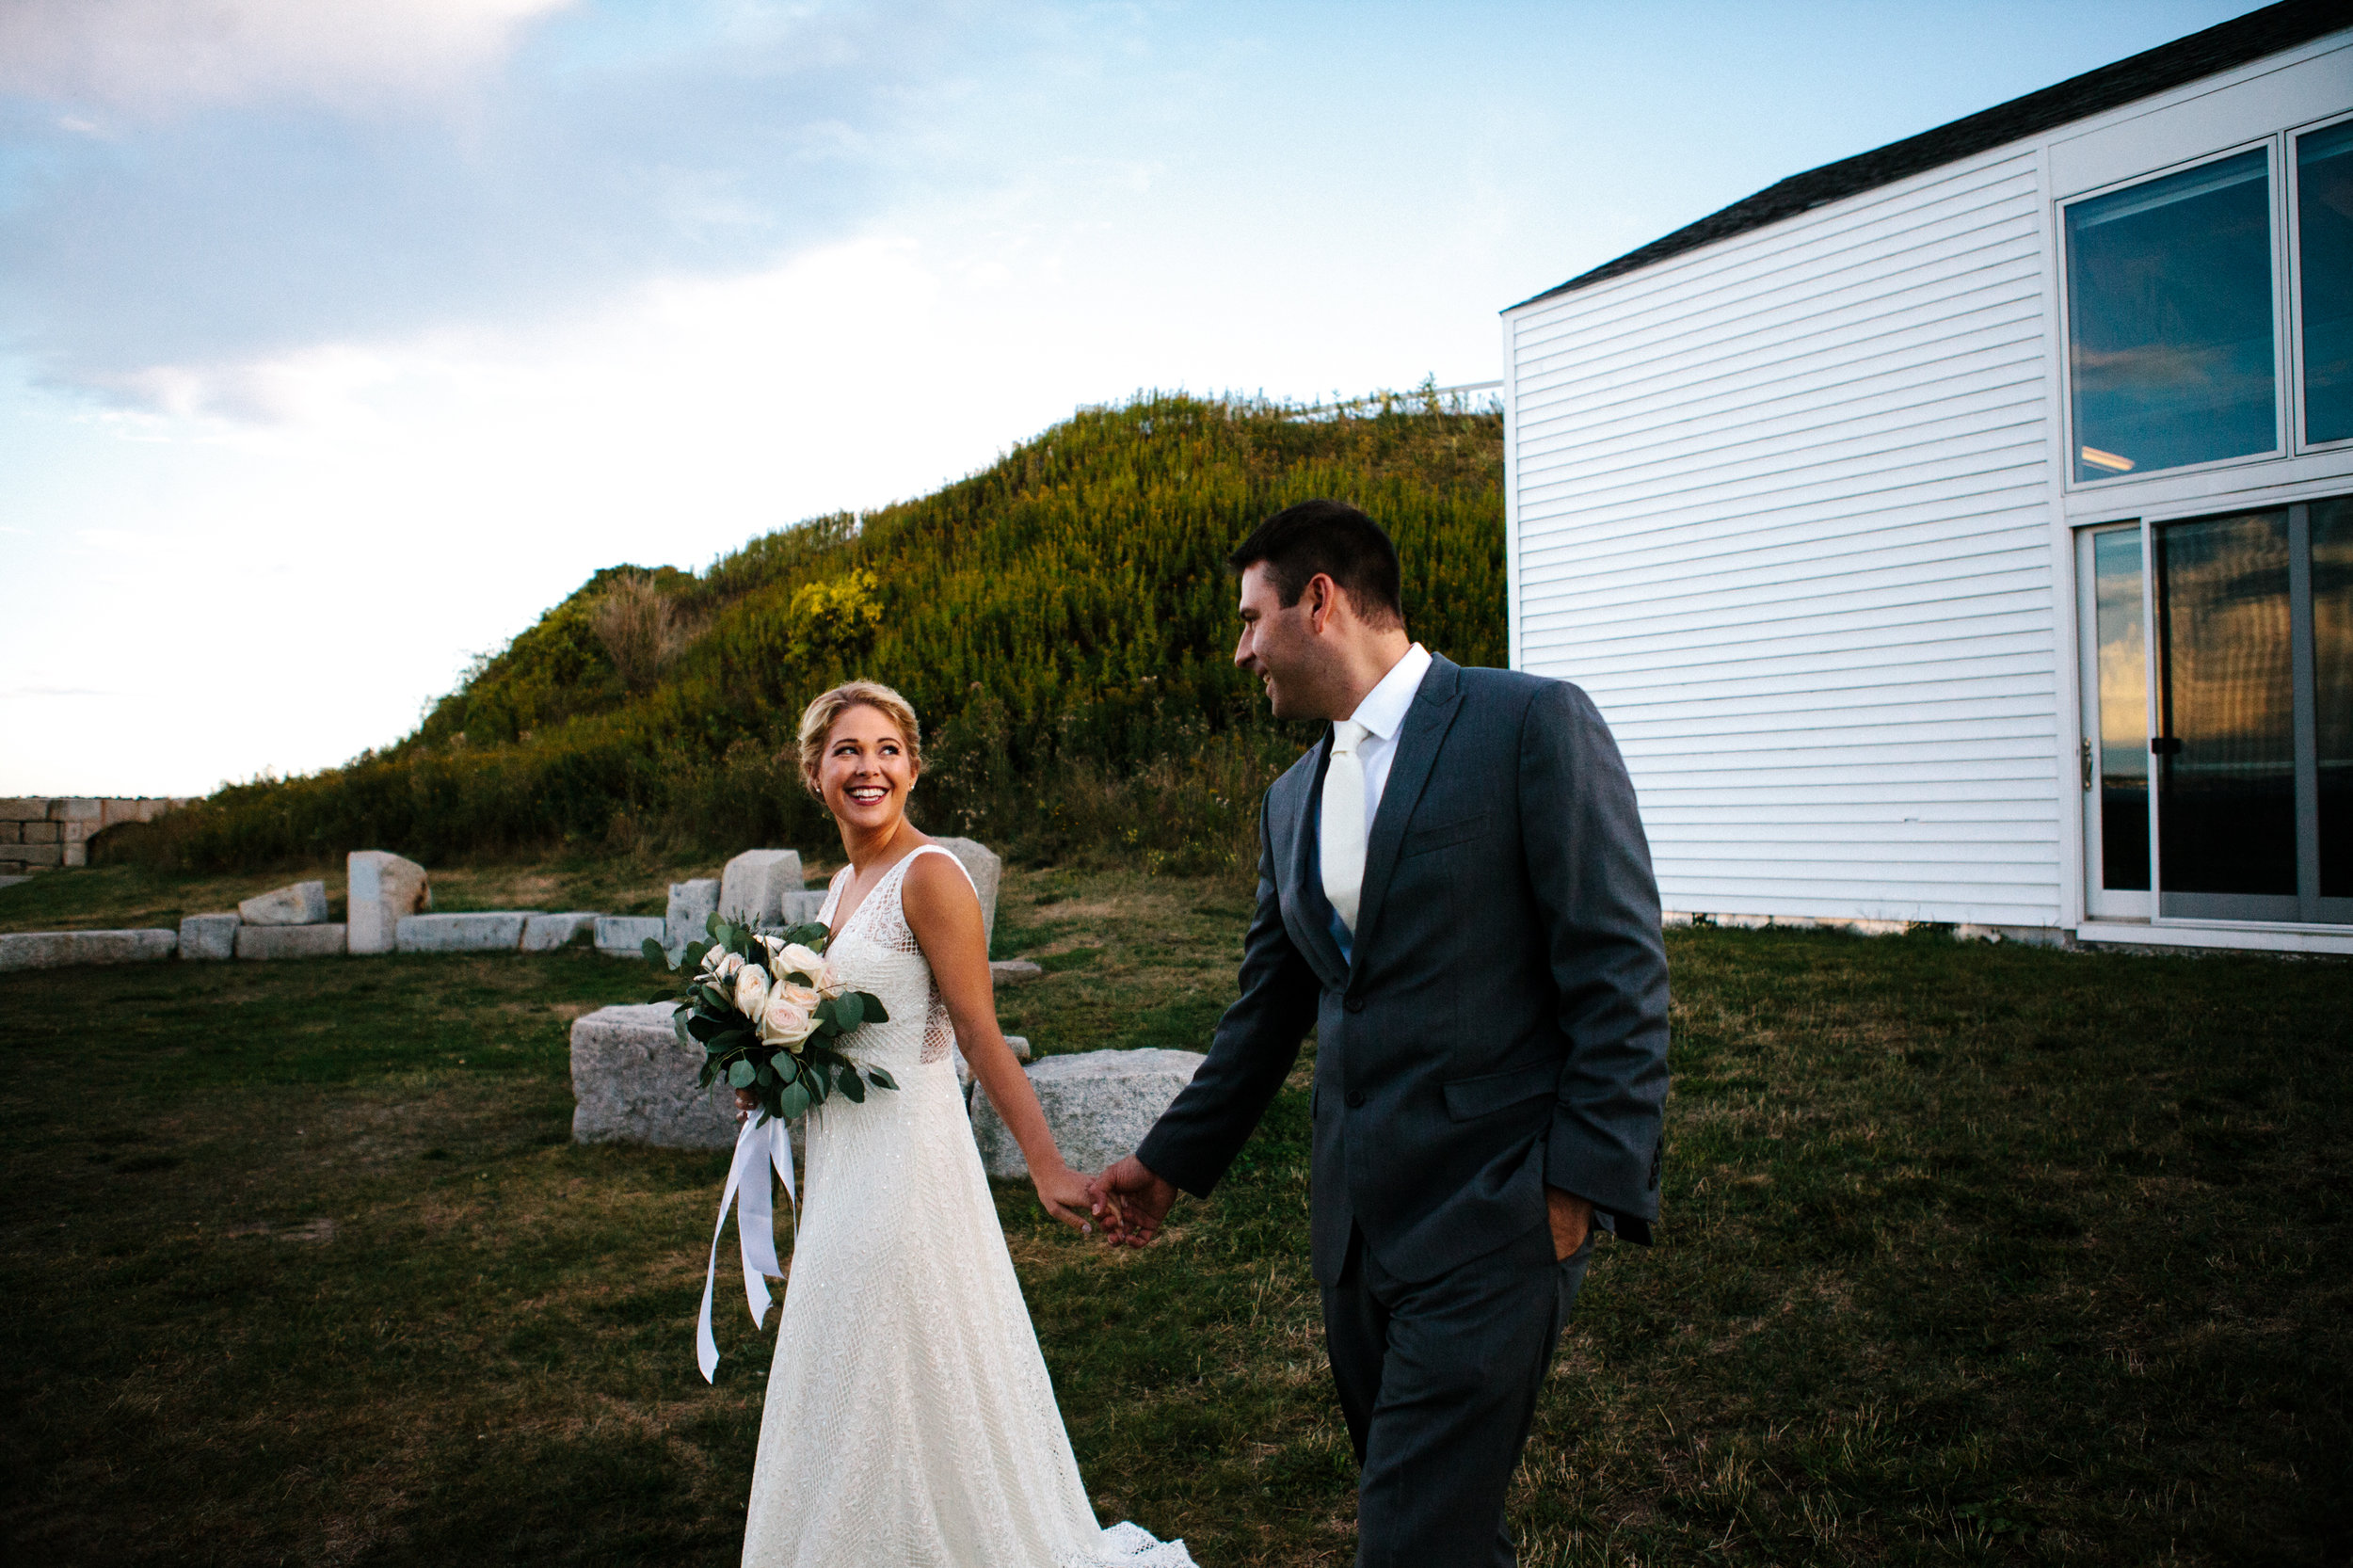 spring-point-ledge-lighthouse-wedding-south-portland-maine-2838.jpg